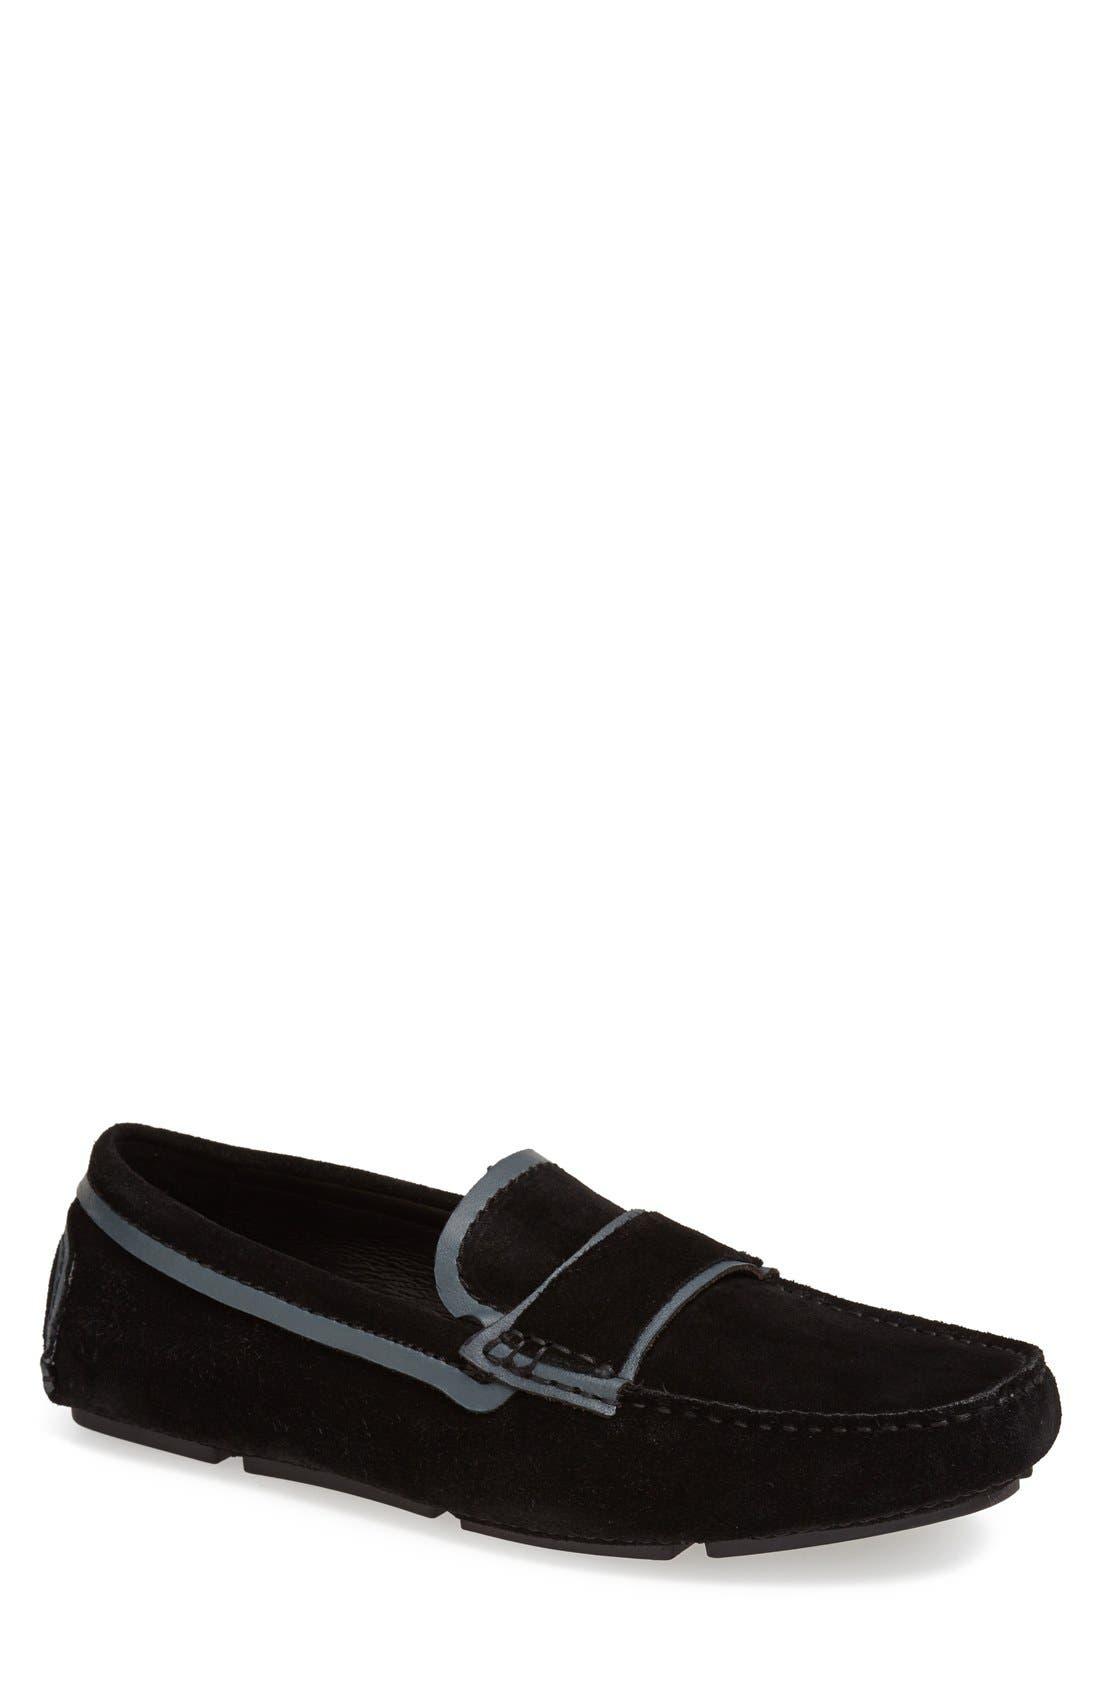 Main Image - Bugatchi 'Agam' Driving Shoe (Men)